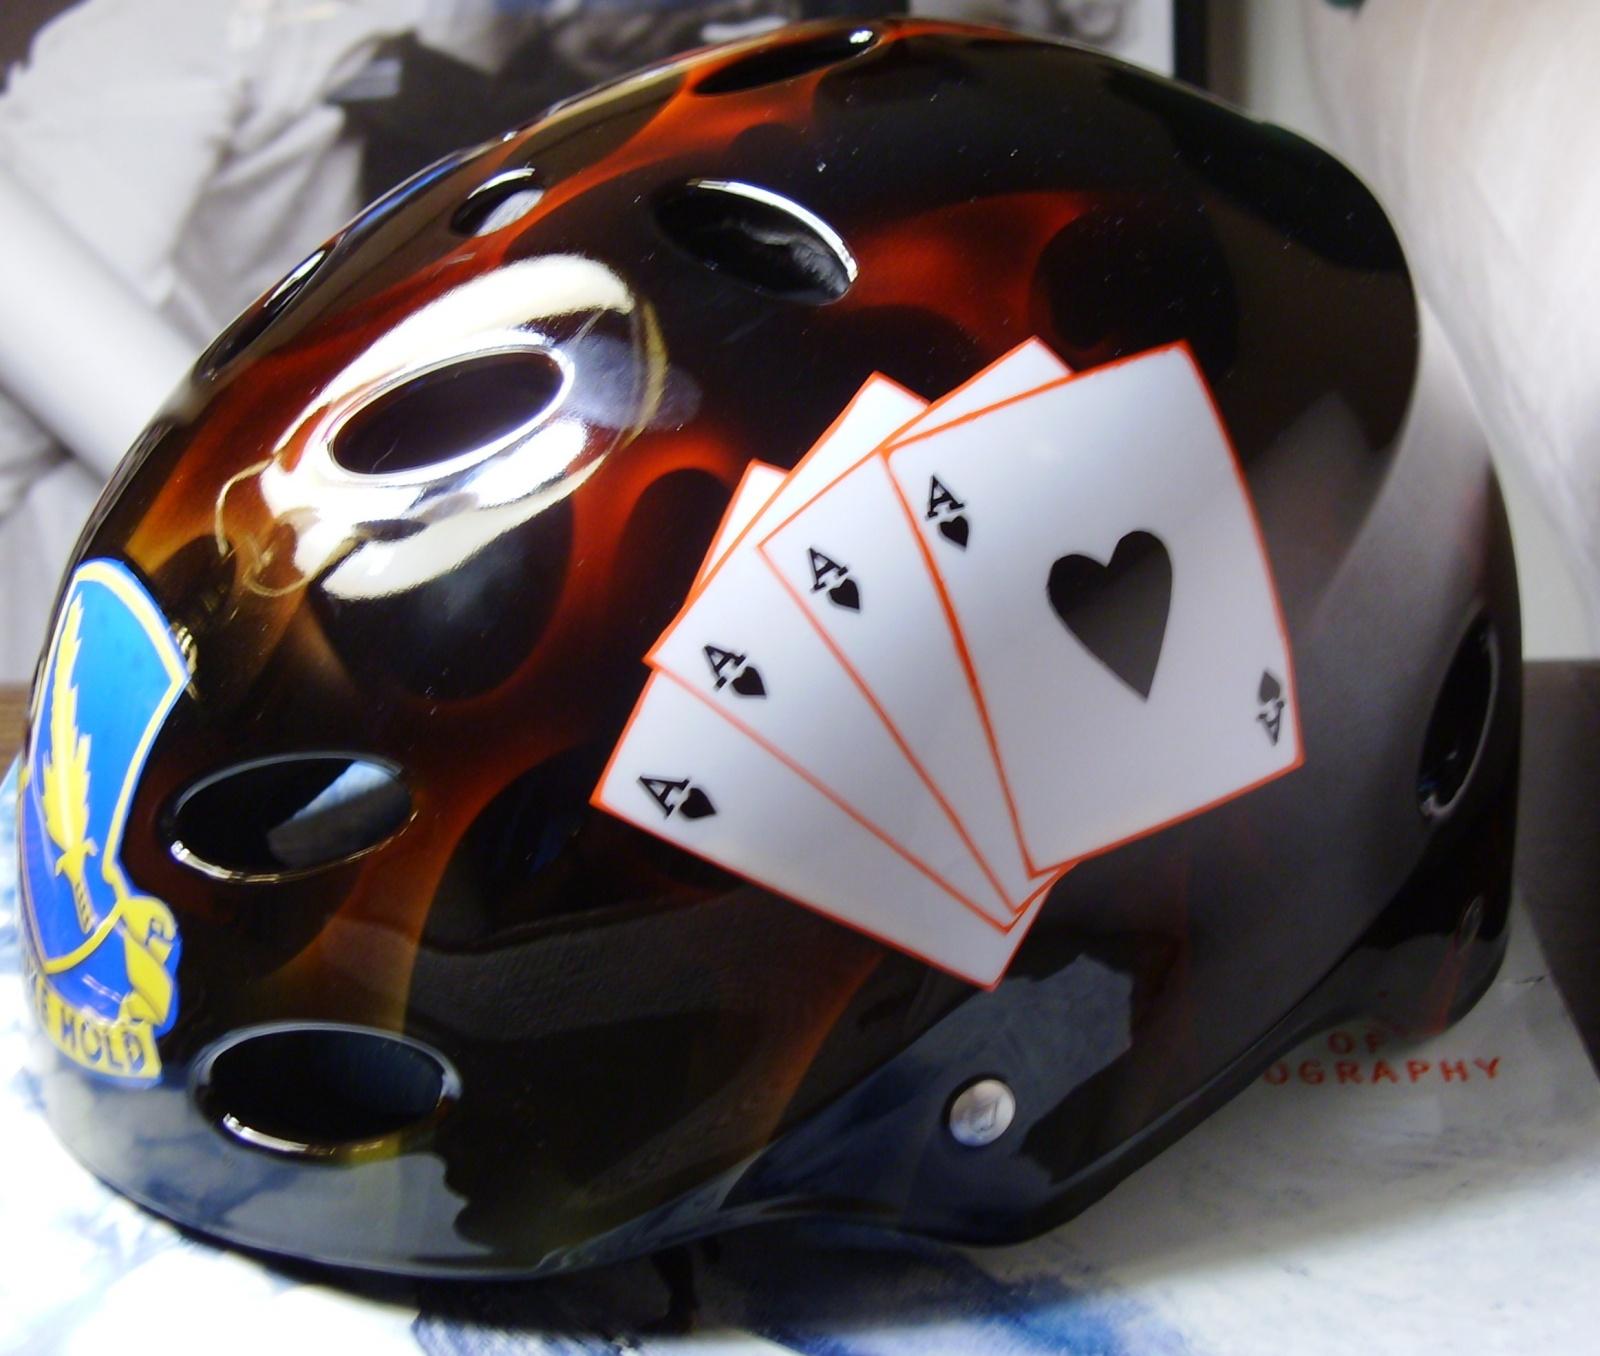 Click image for larger version  Name:Custom kayak helmet 016.jpg Views:398 Size:442.8 KB ID:844